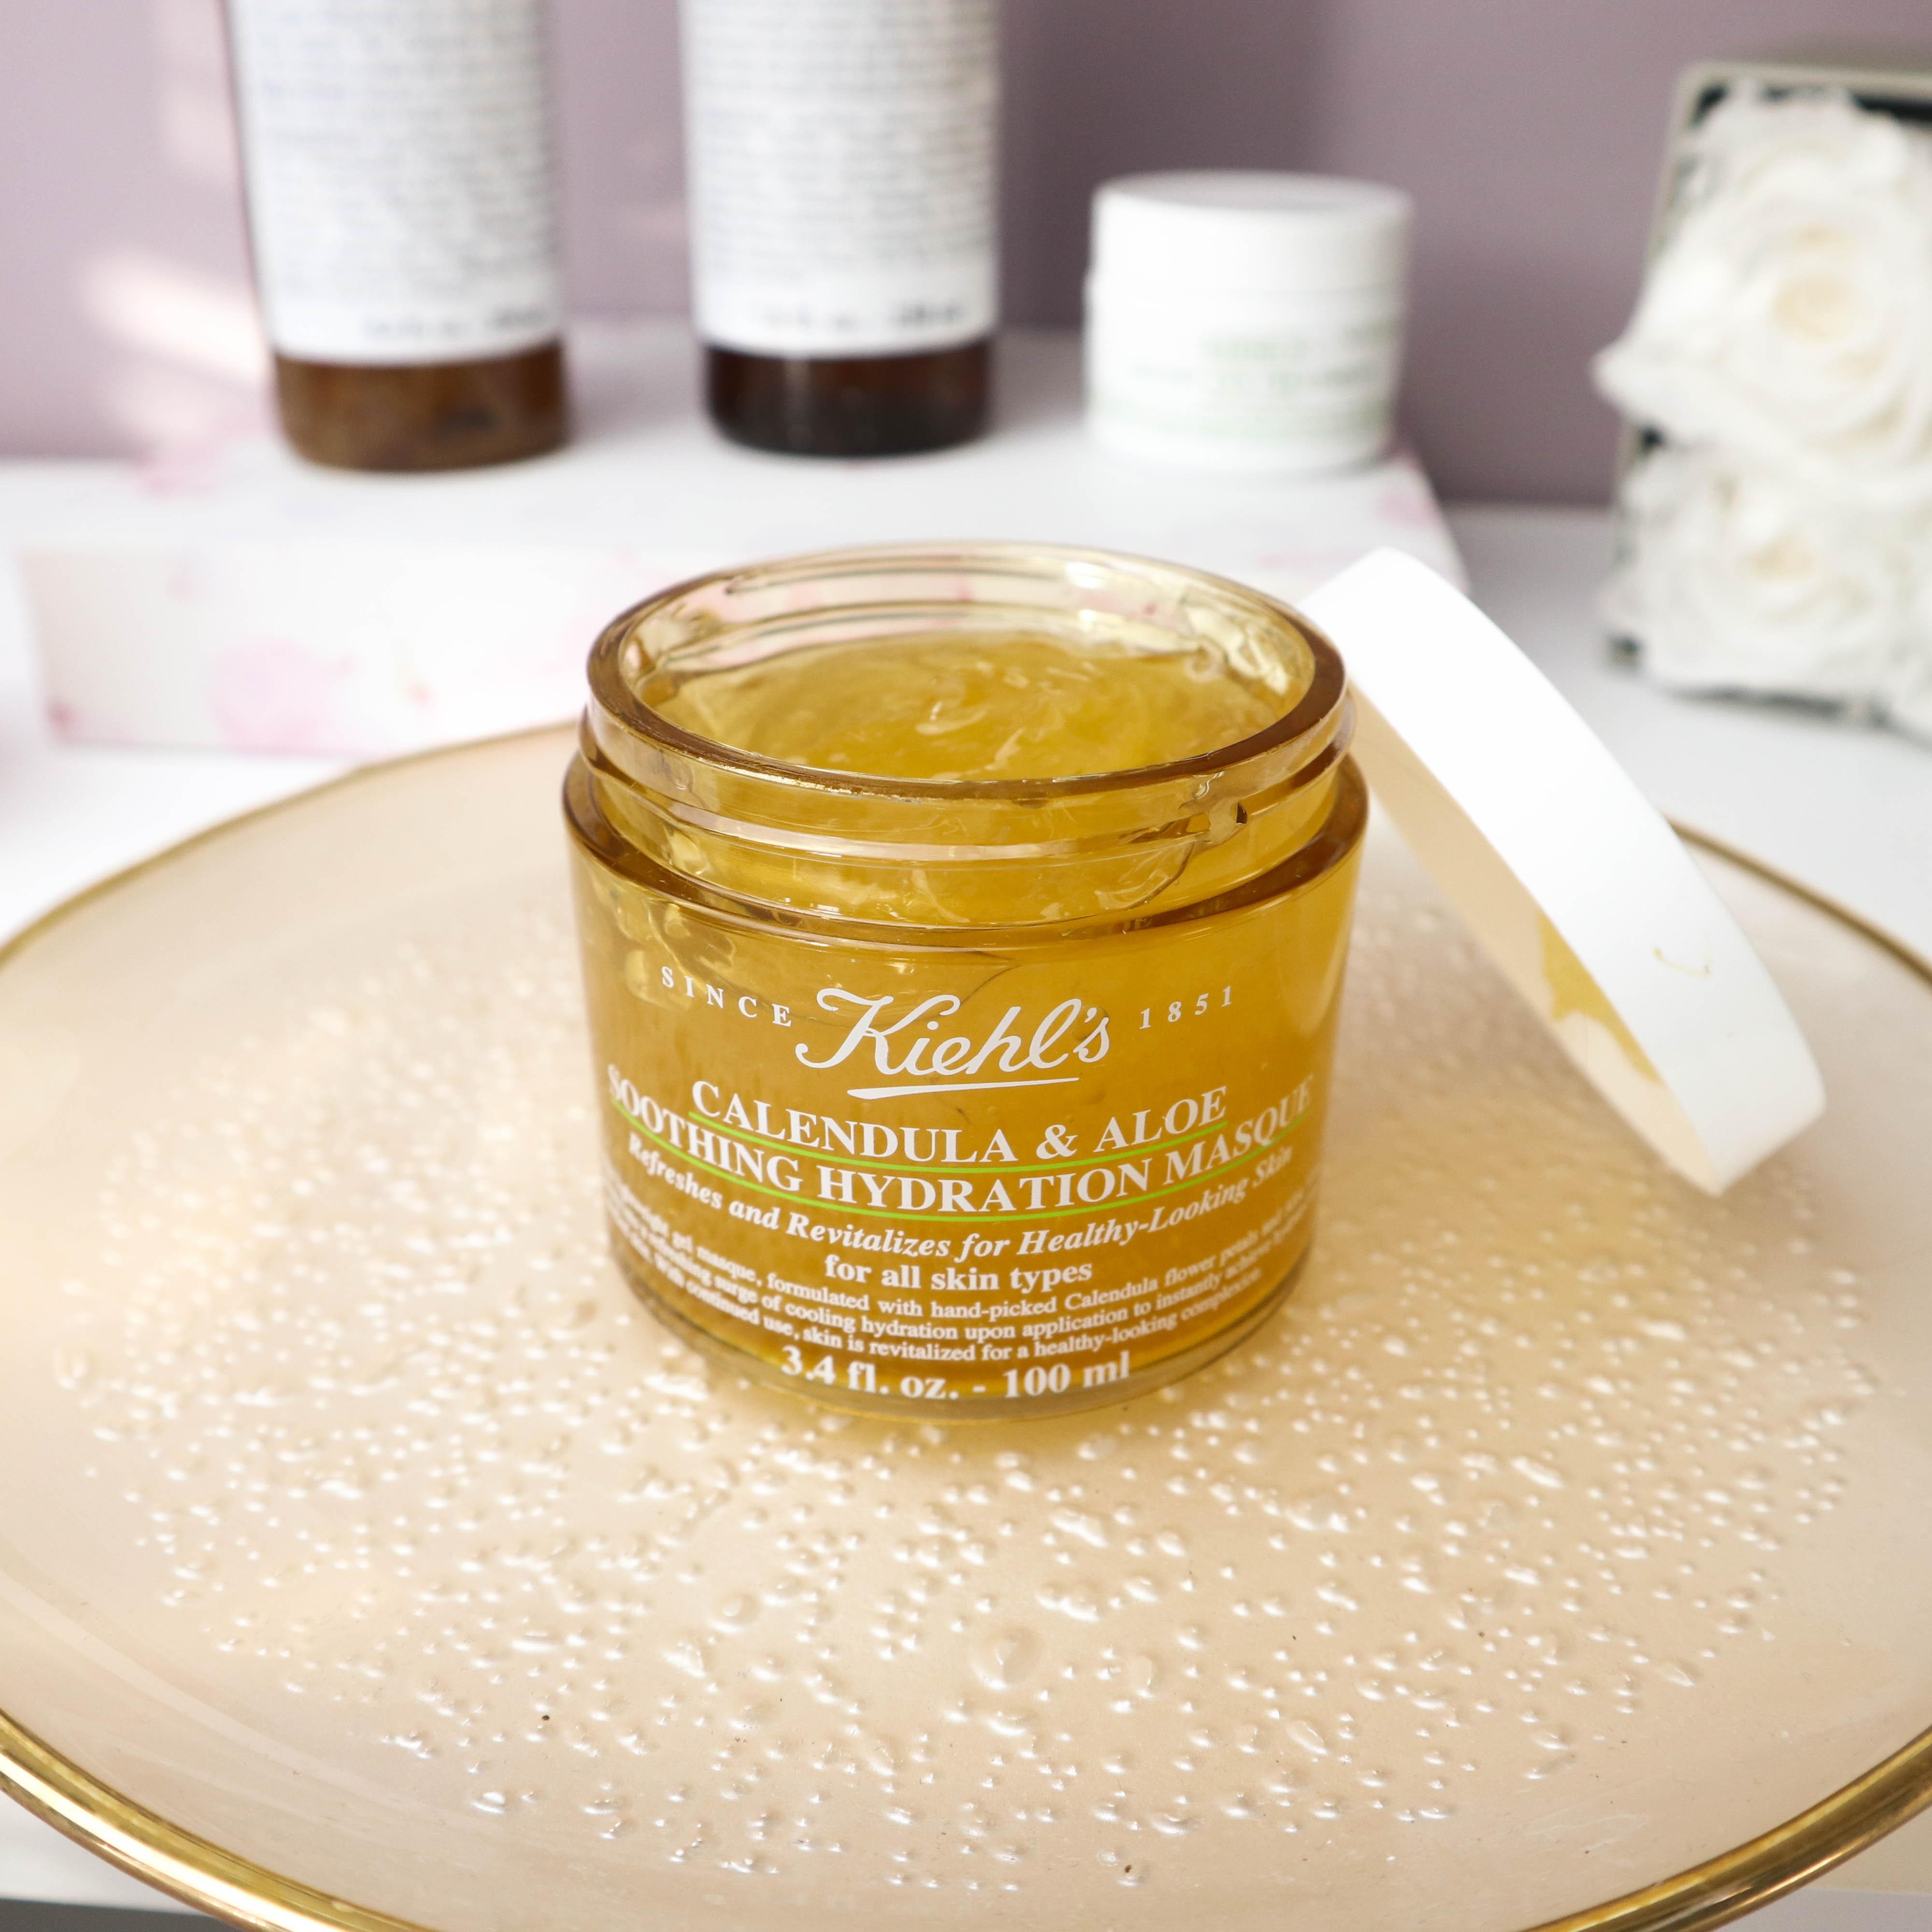 top 5 beauty brands lieblings beauty marken kiehl's calendula aloe masque kardiaserena